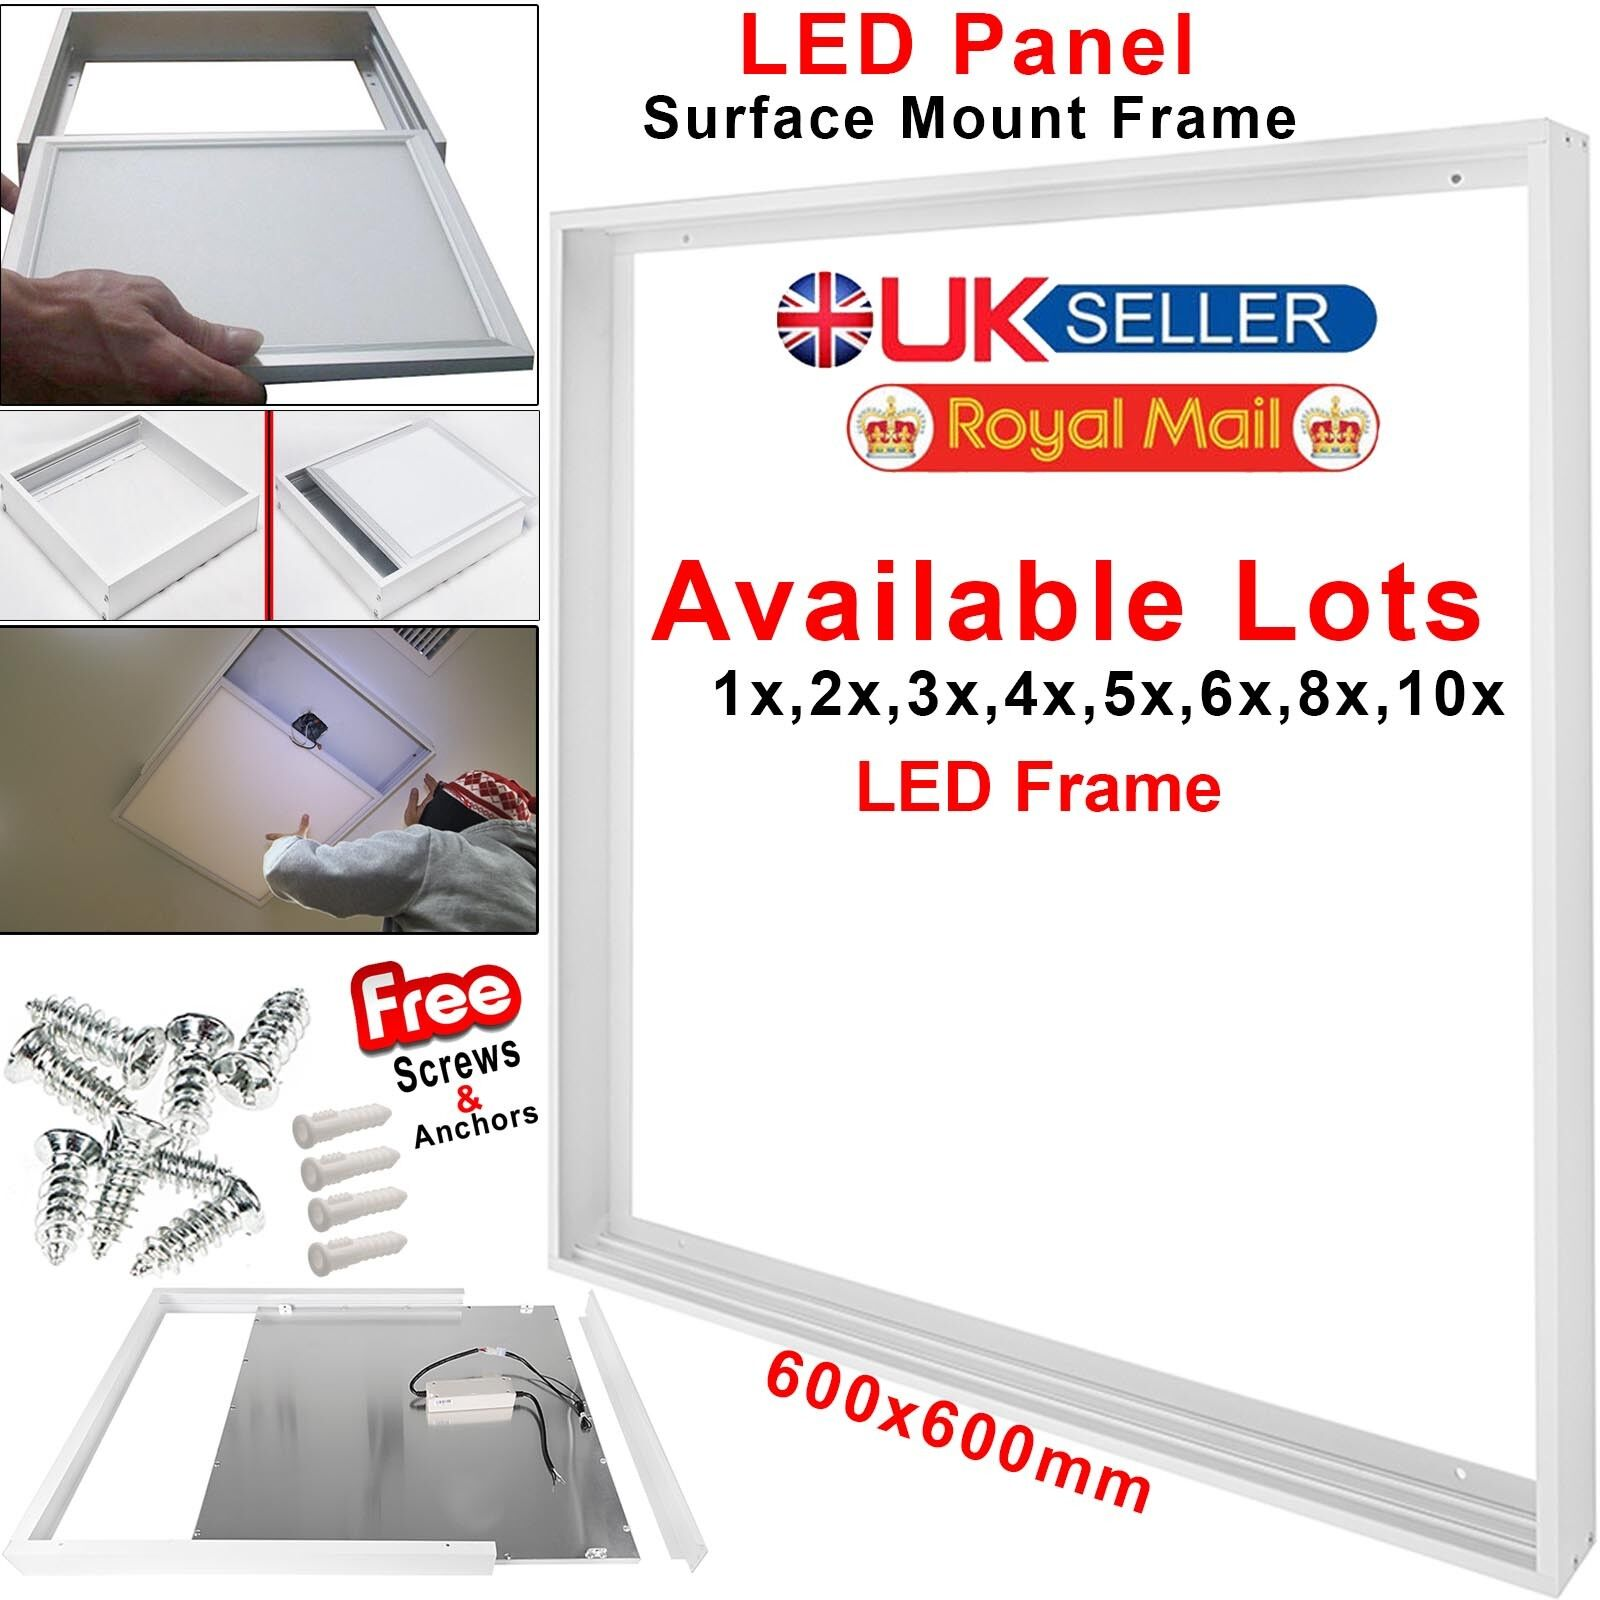 1-10 Pcs Surface Mount Frame 600x600mm Kit For Flat LED Panel Ceiling Lamp Light